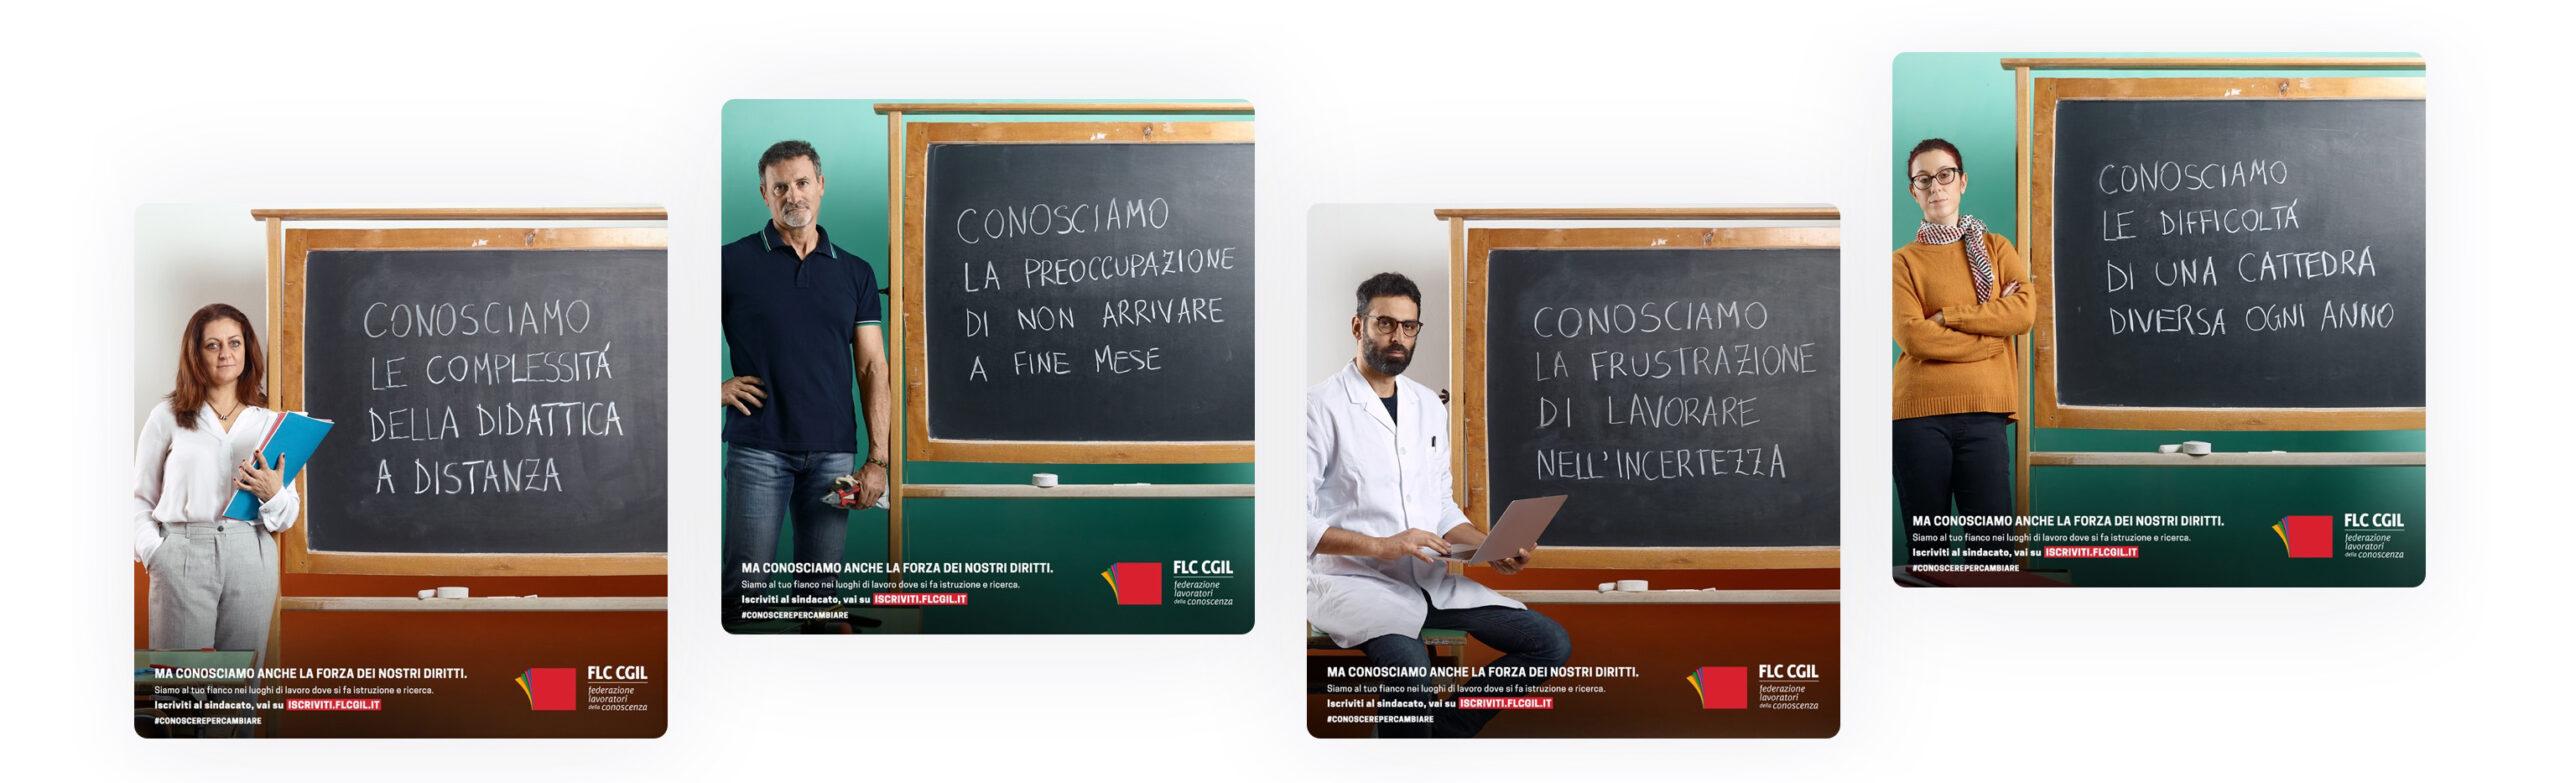 card social flc cgil campaign